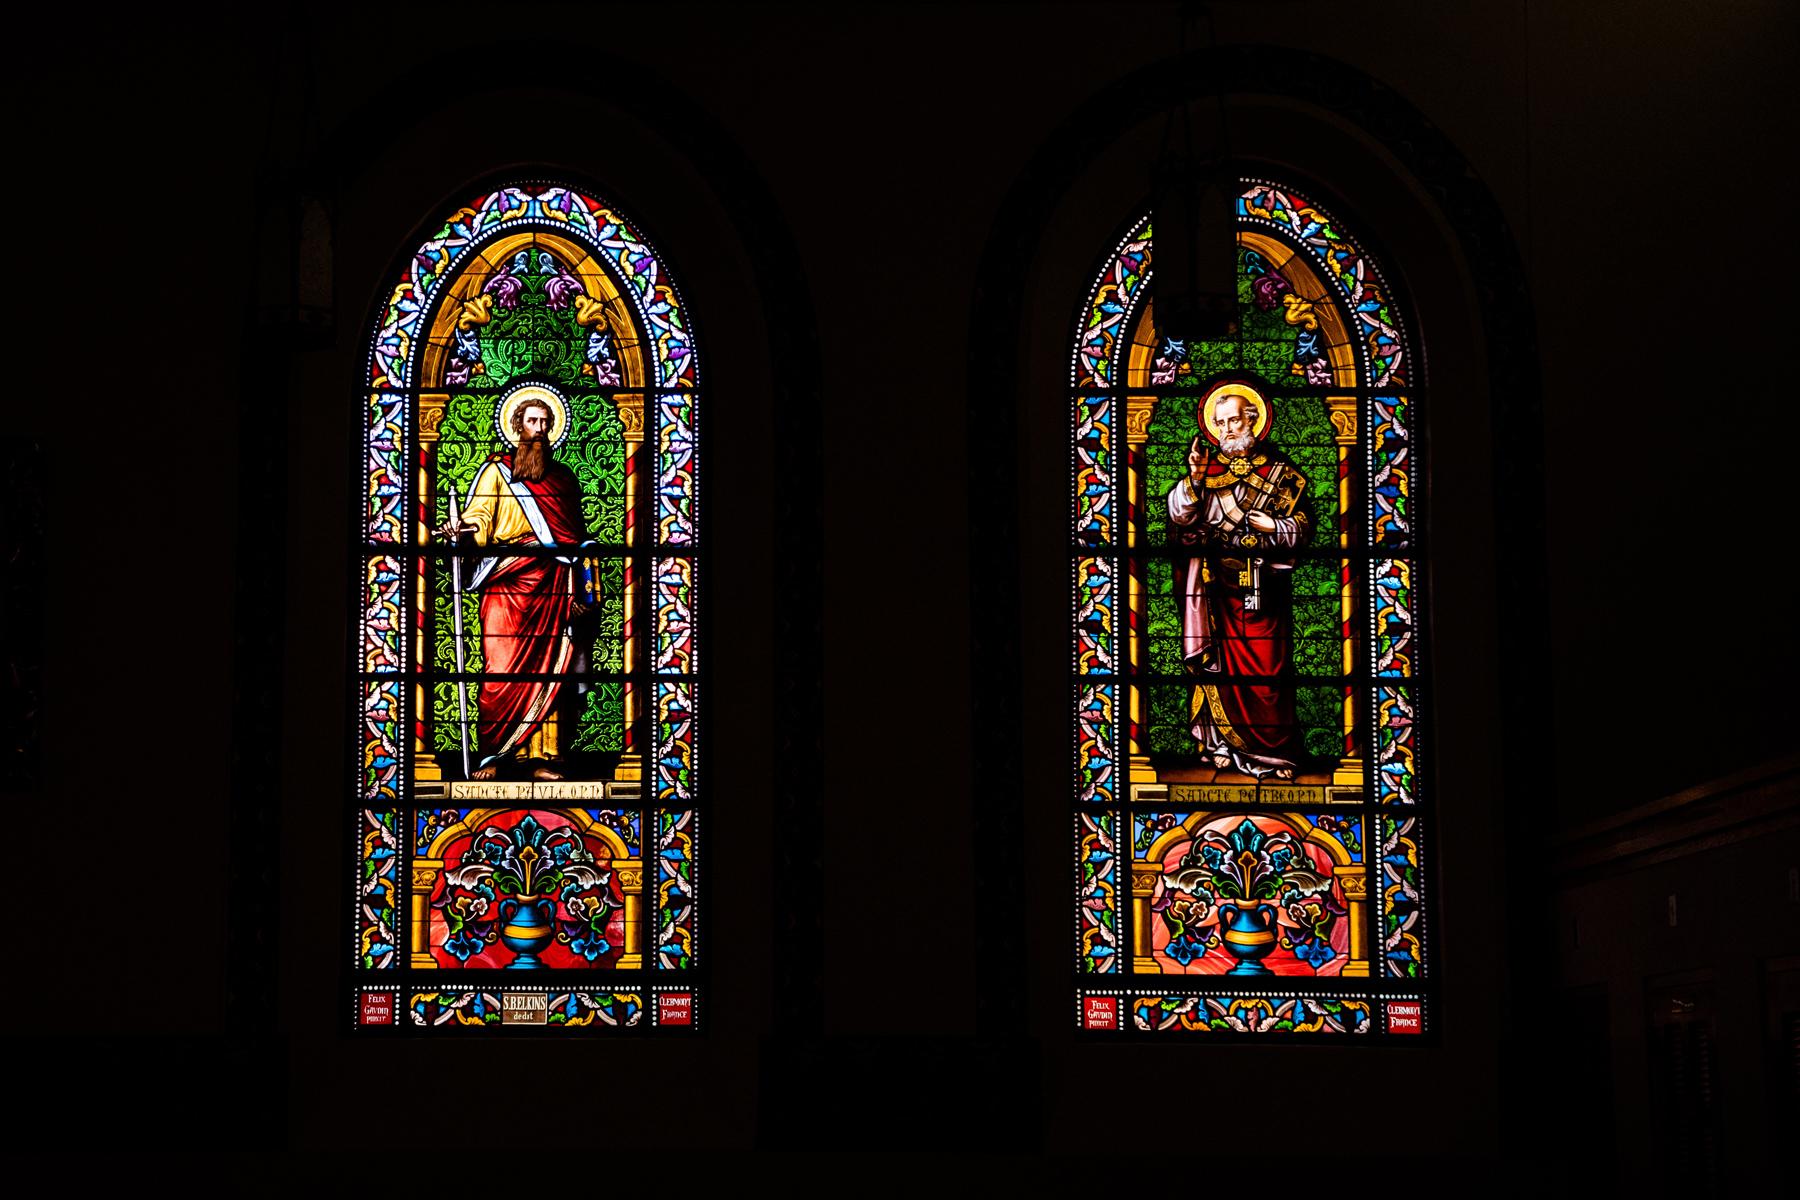 santa-fe-travel-photography-kandisebrown-04